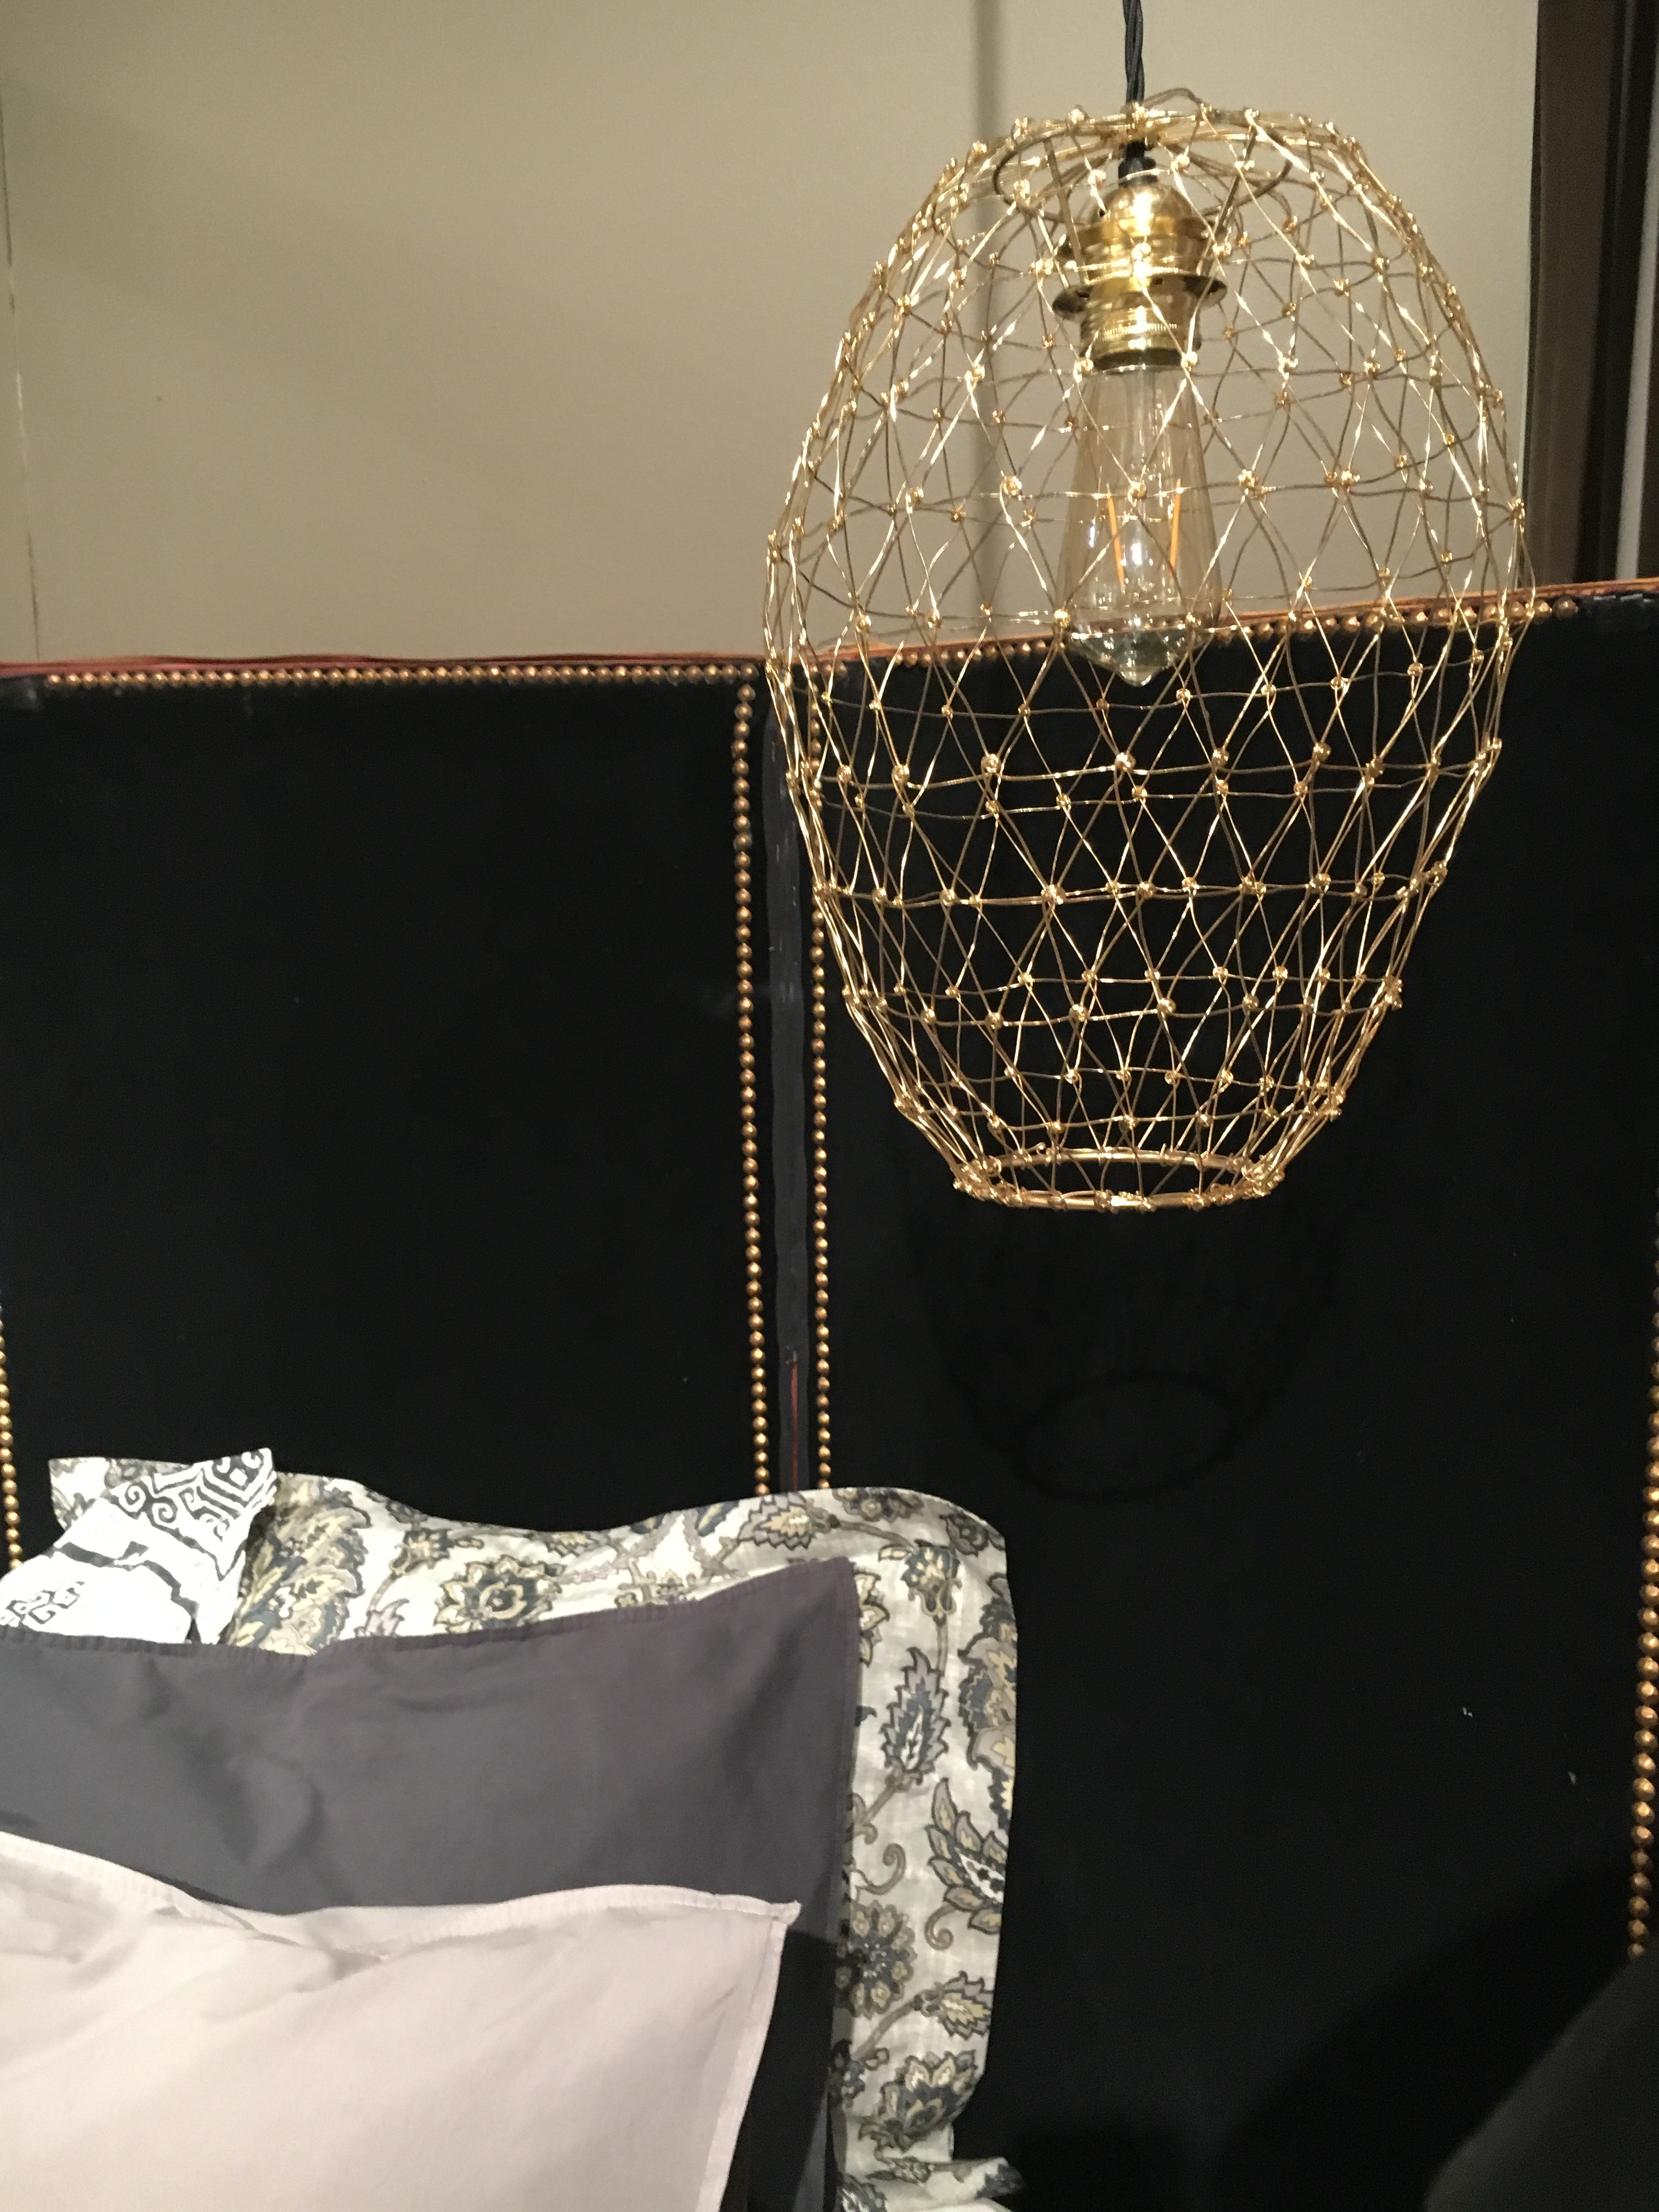 Snyggaste lampan hos Hemtex